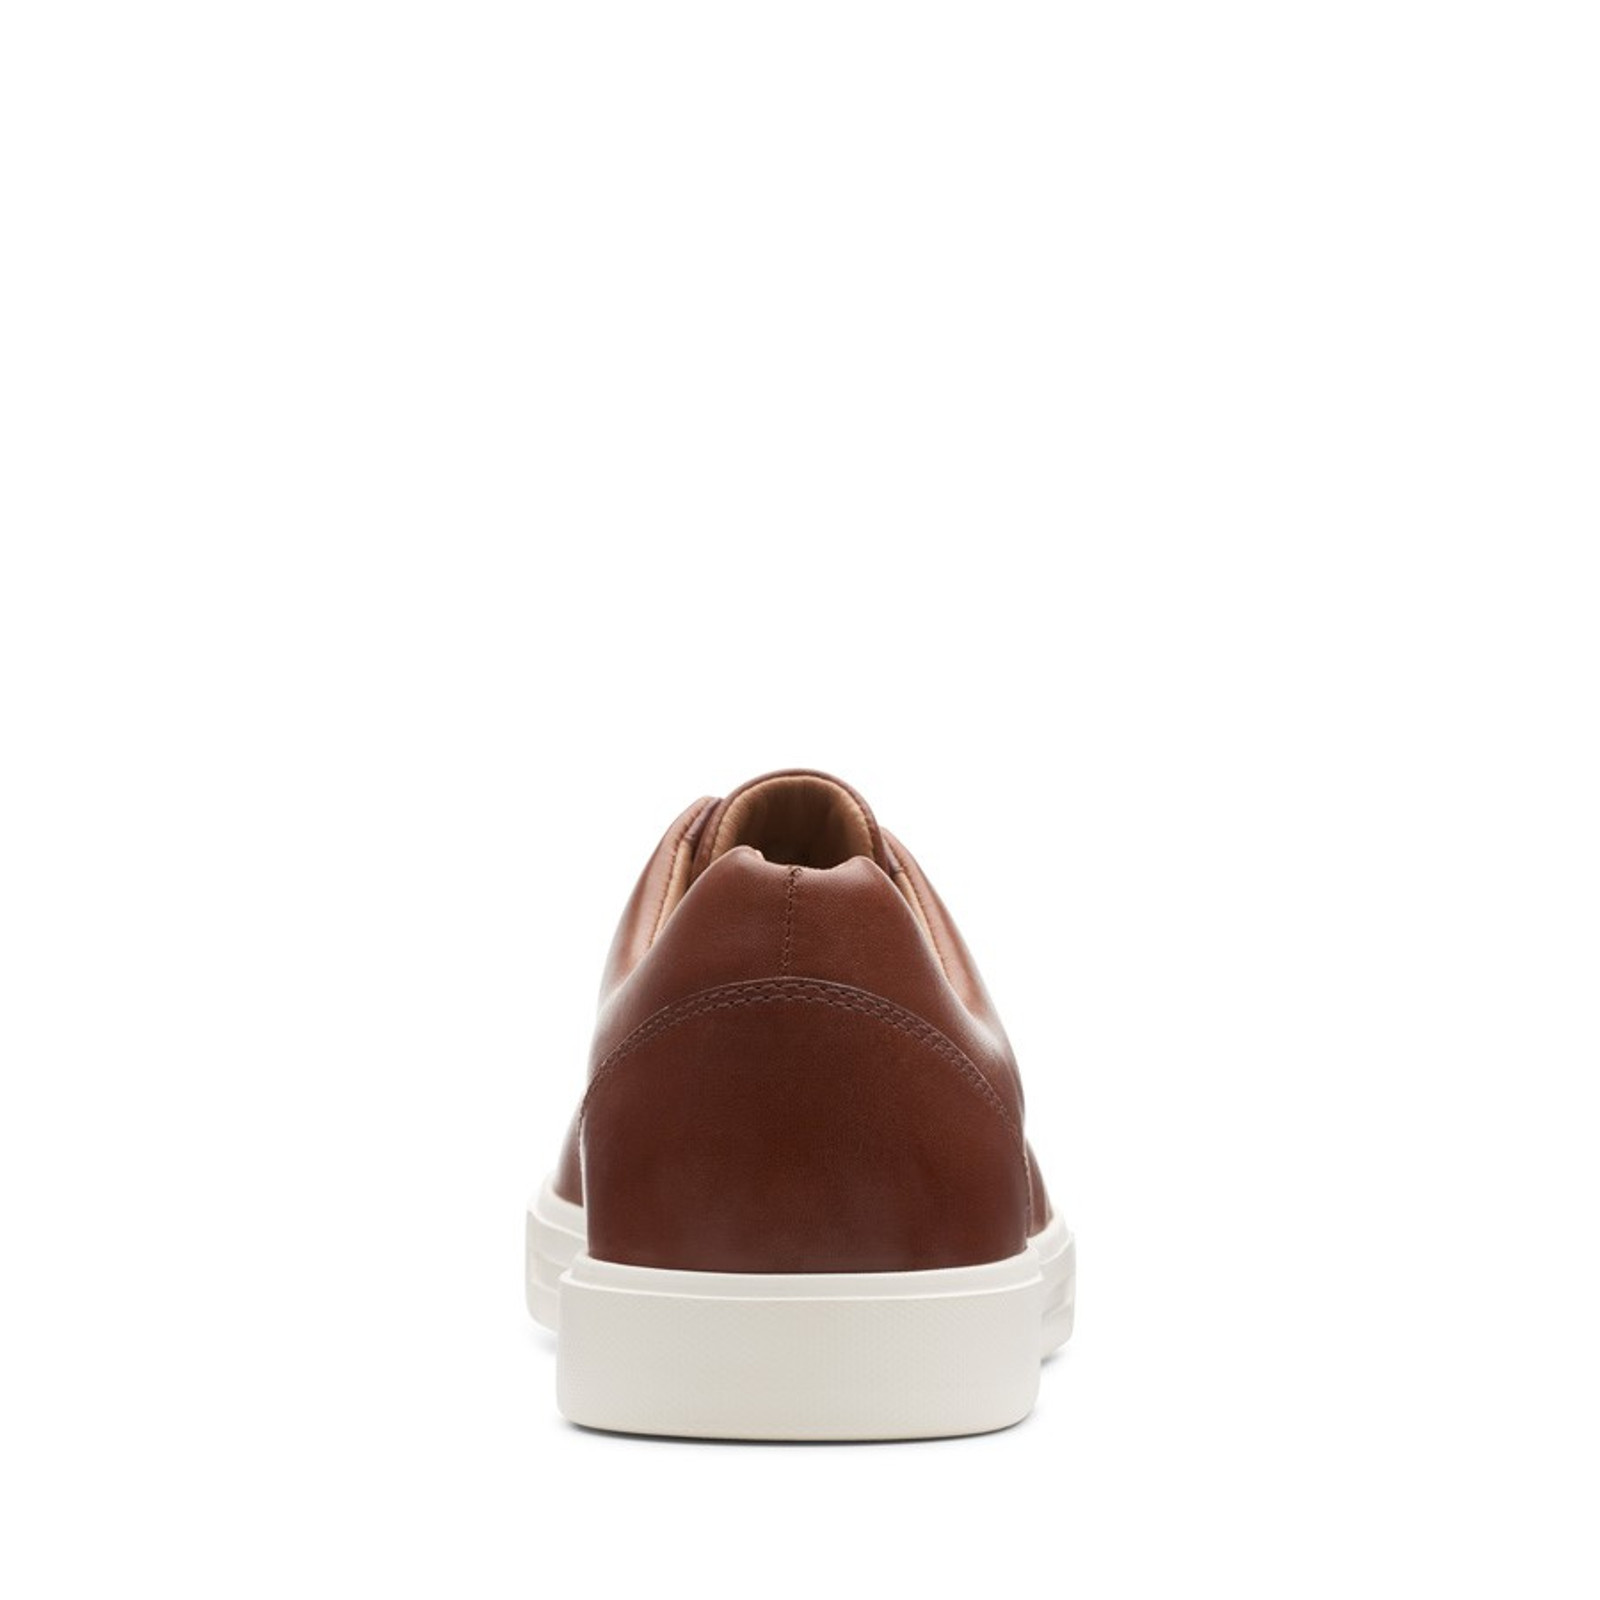 Clarks Mens UN COSTA LACE British Tan Leather